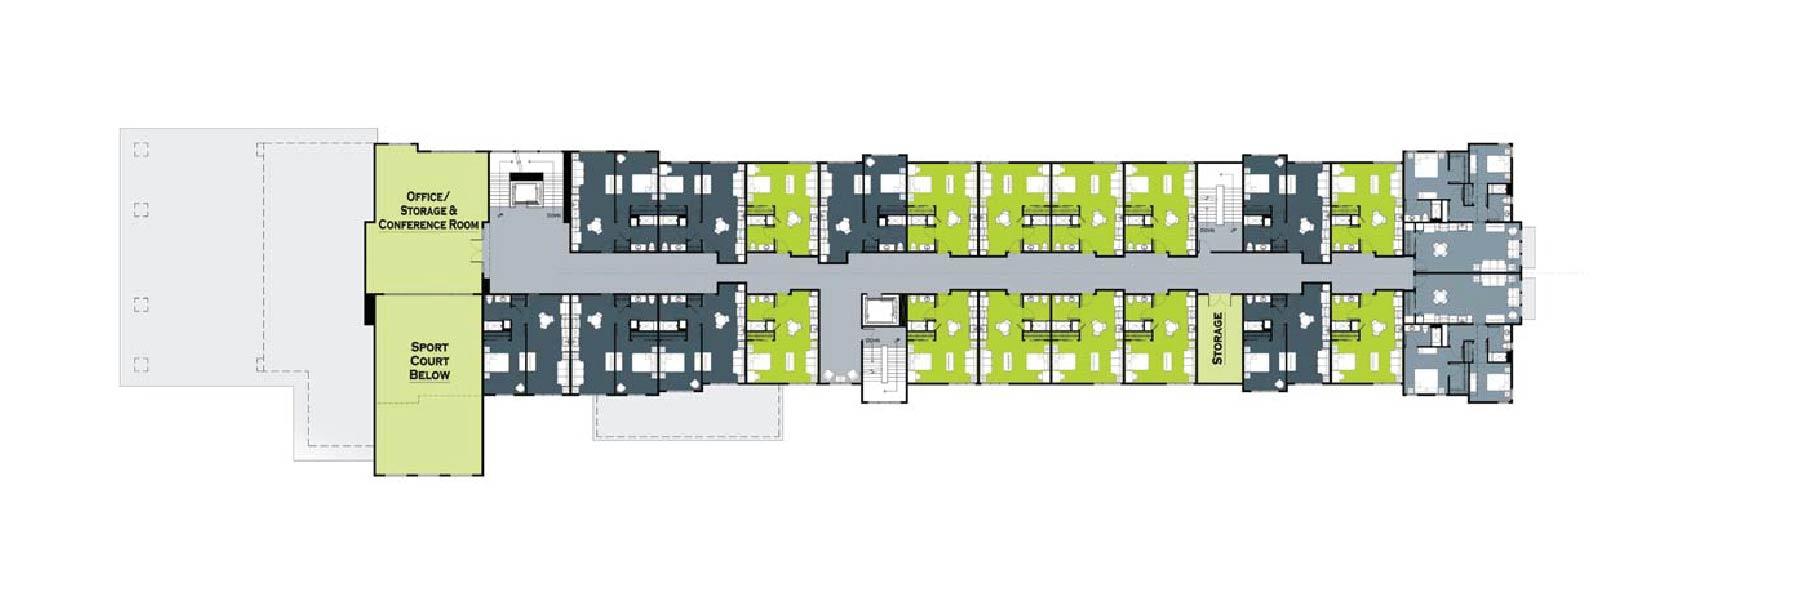 Trailhead Level 2 Floor Plans